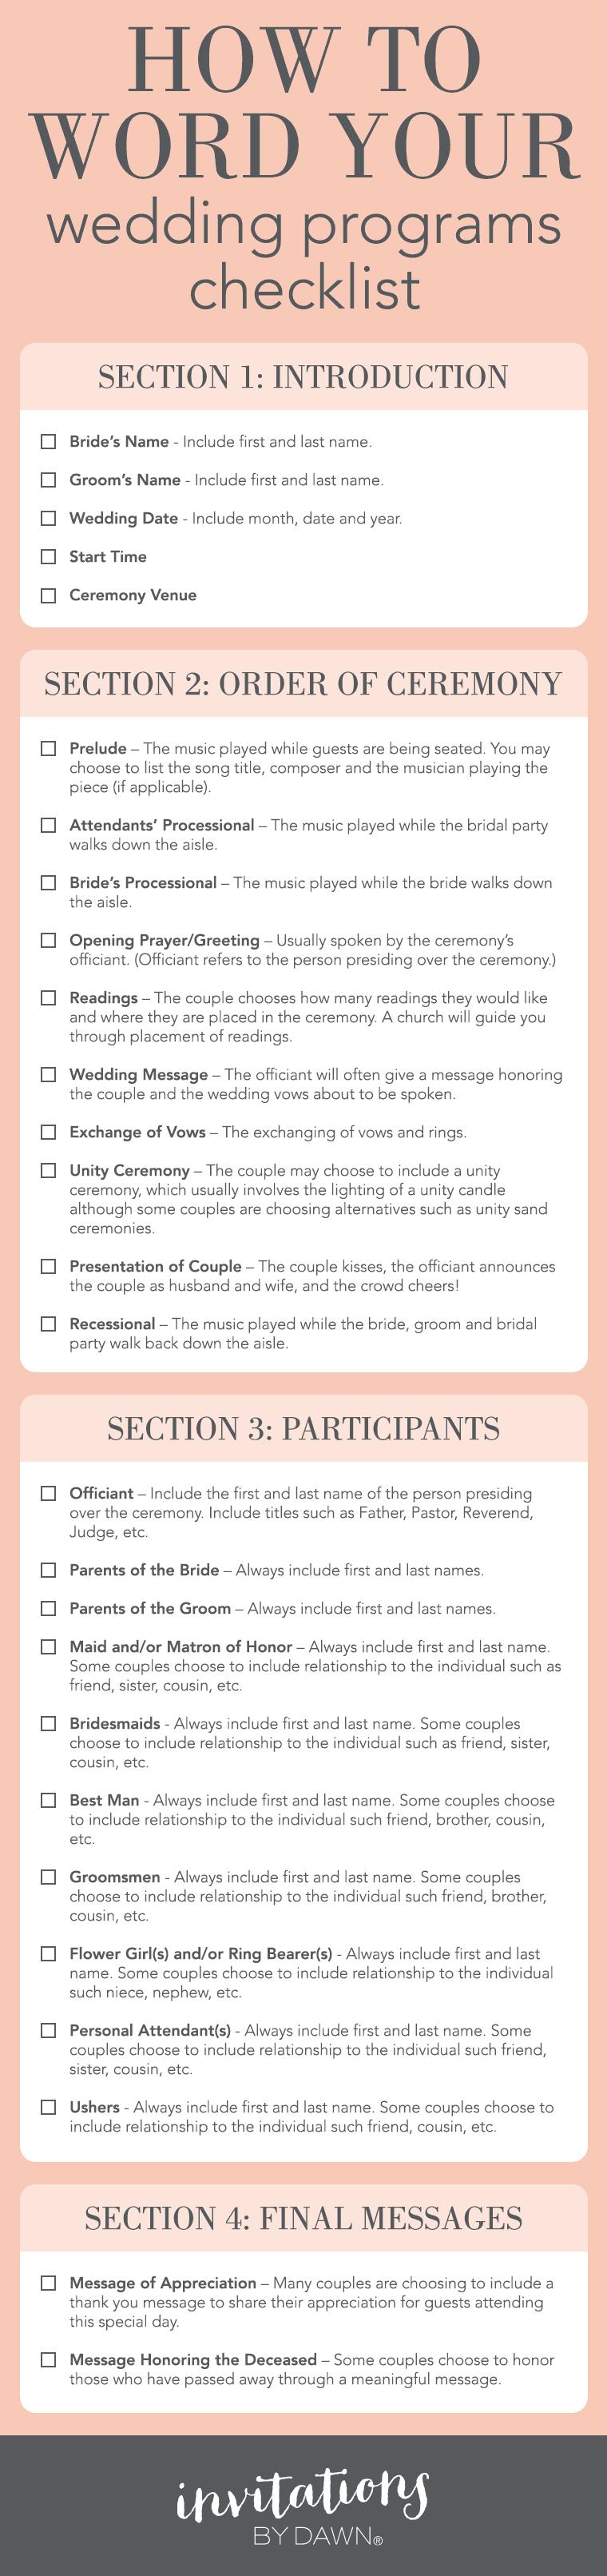 Wedding Program Checklist